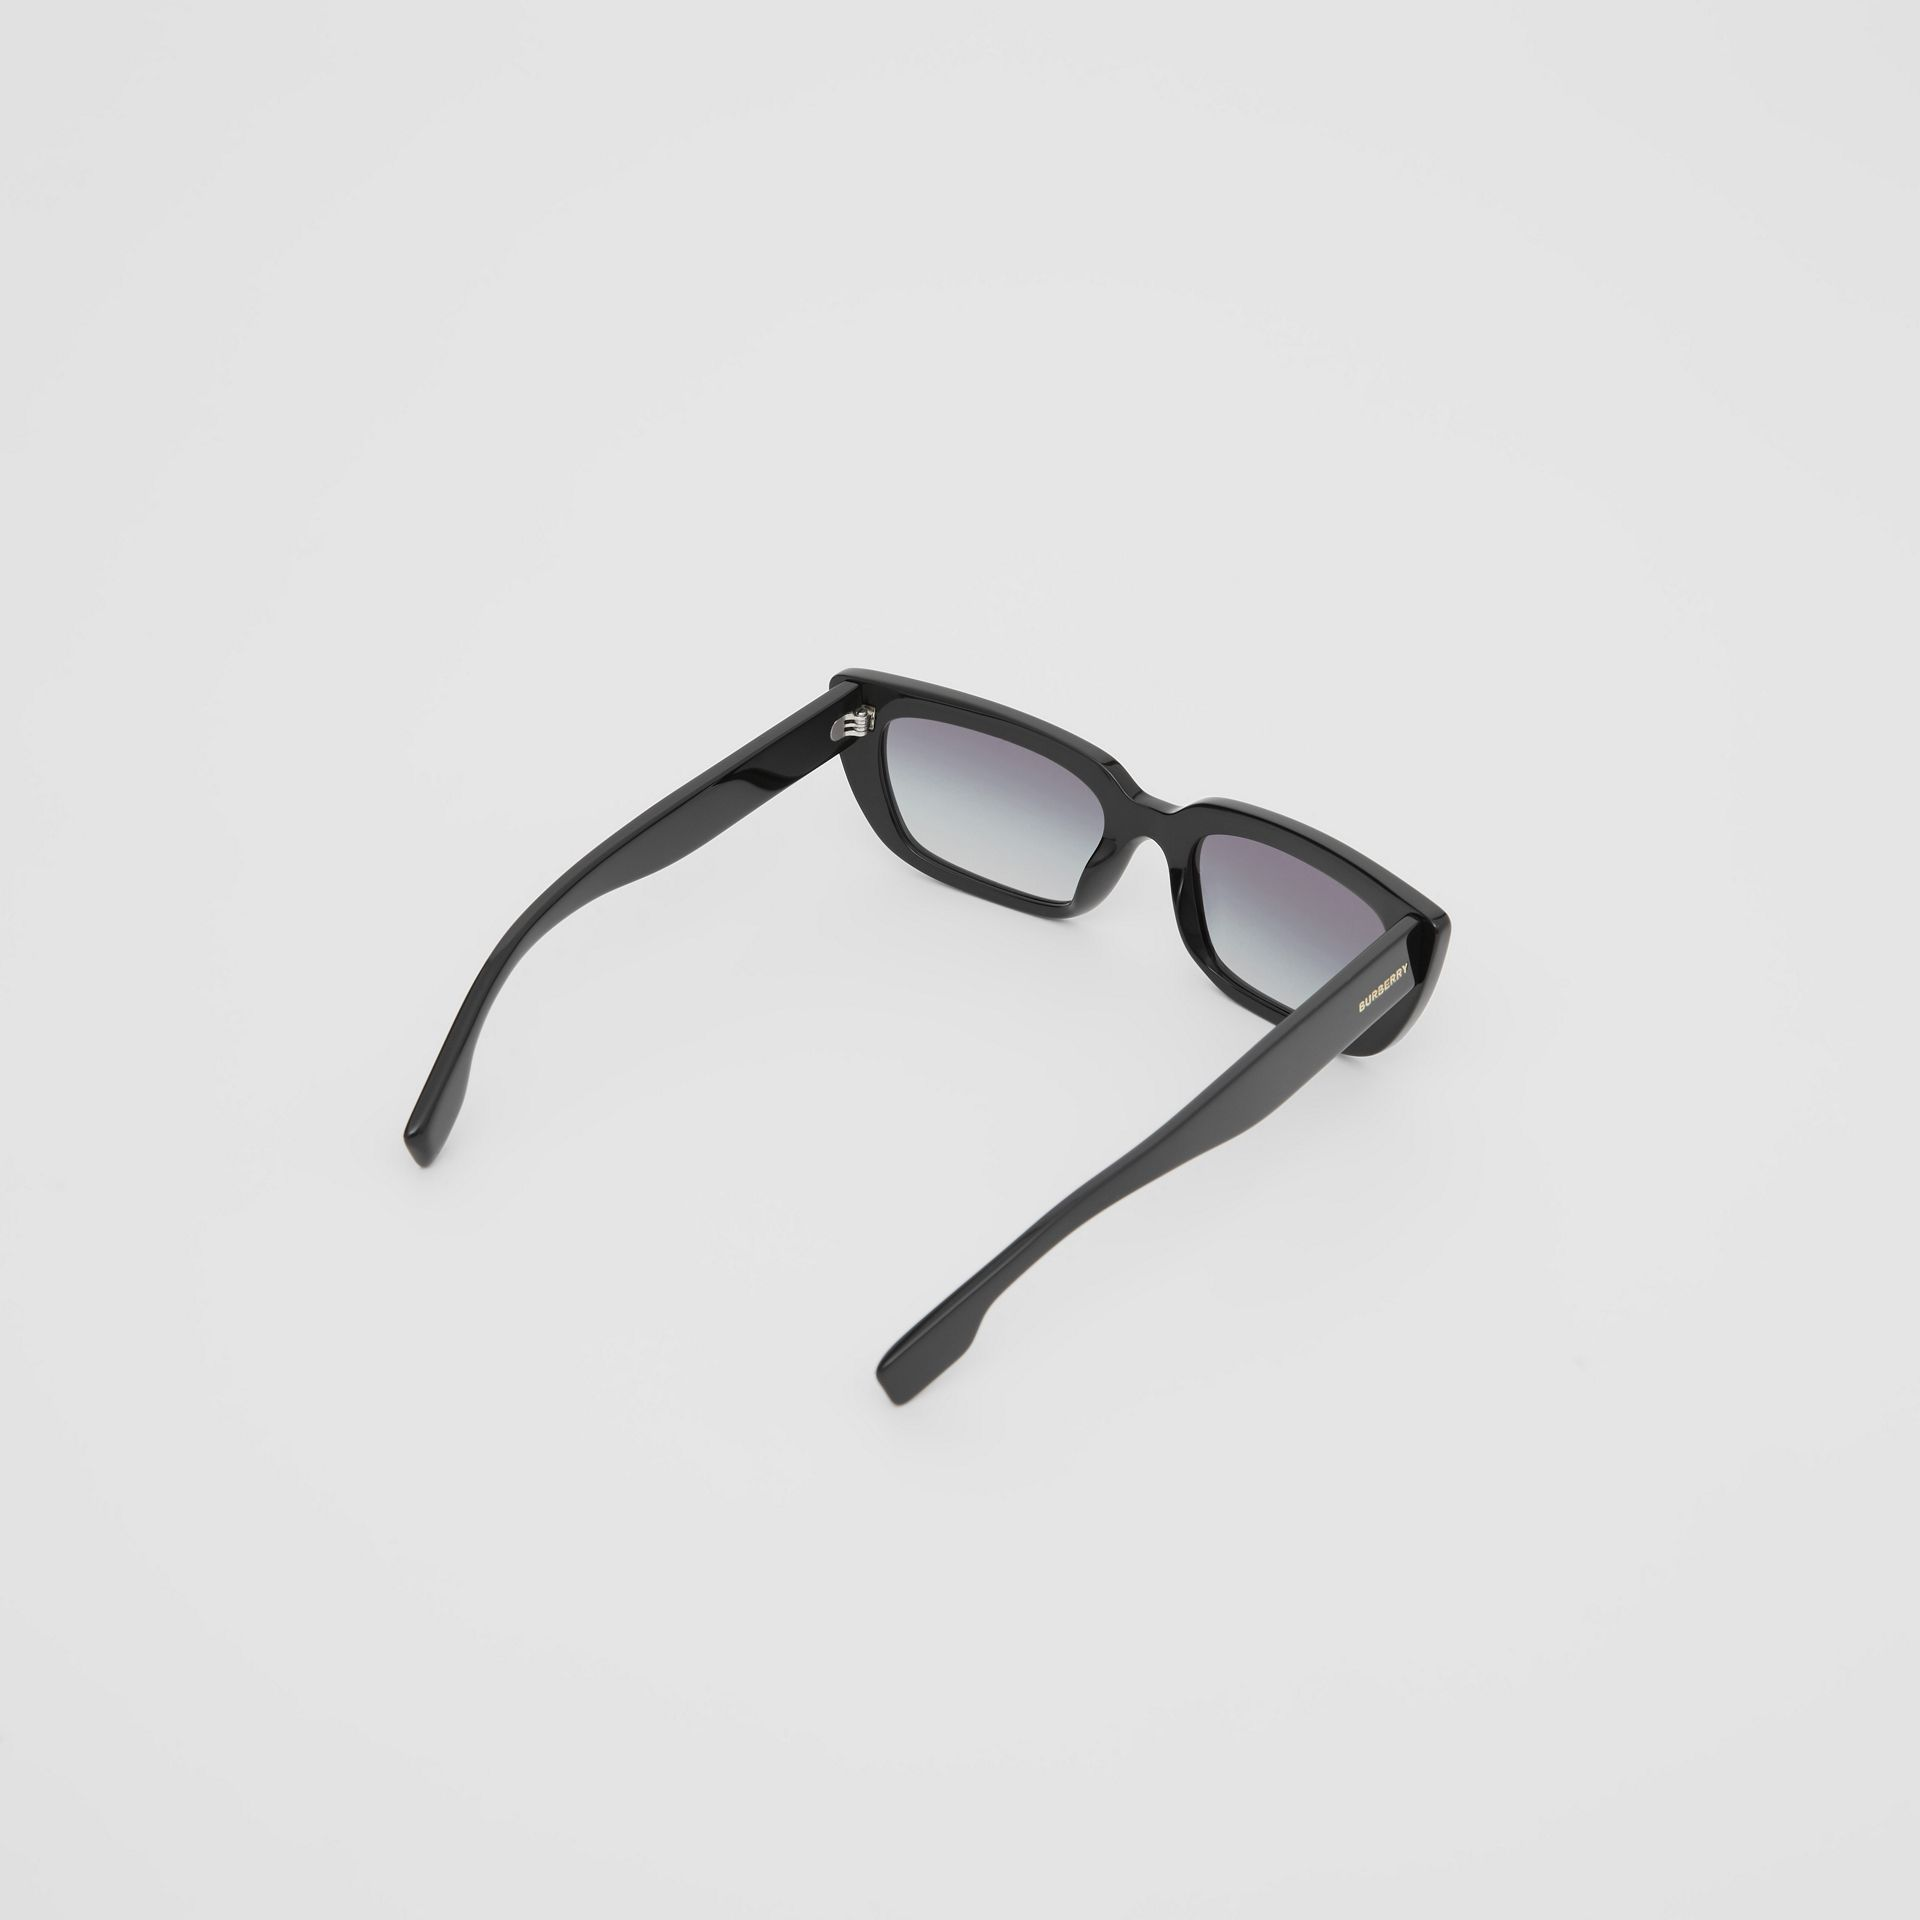 Bio-acetate Rectangular Frame Sunglasses in Black - Women | Burberry Australia - gallery image 4